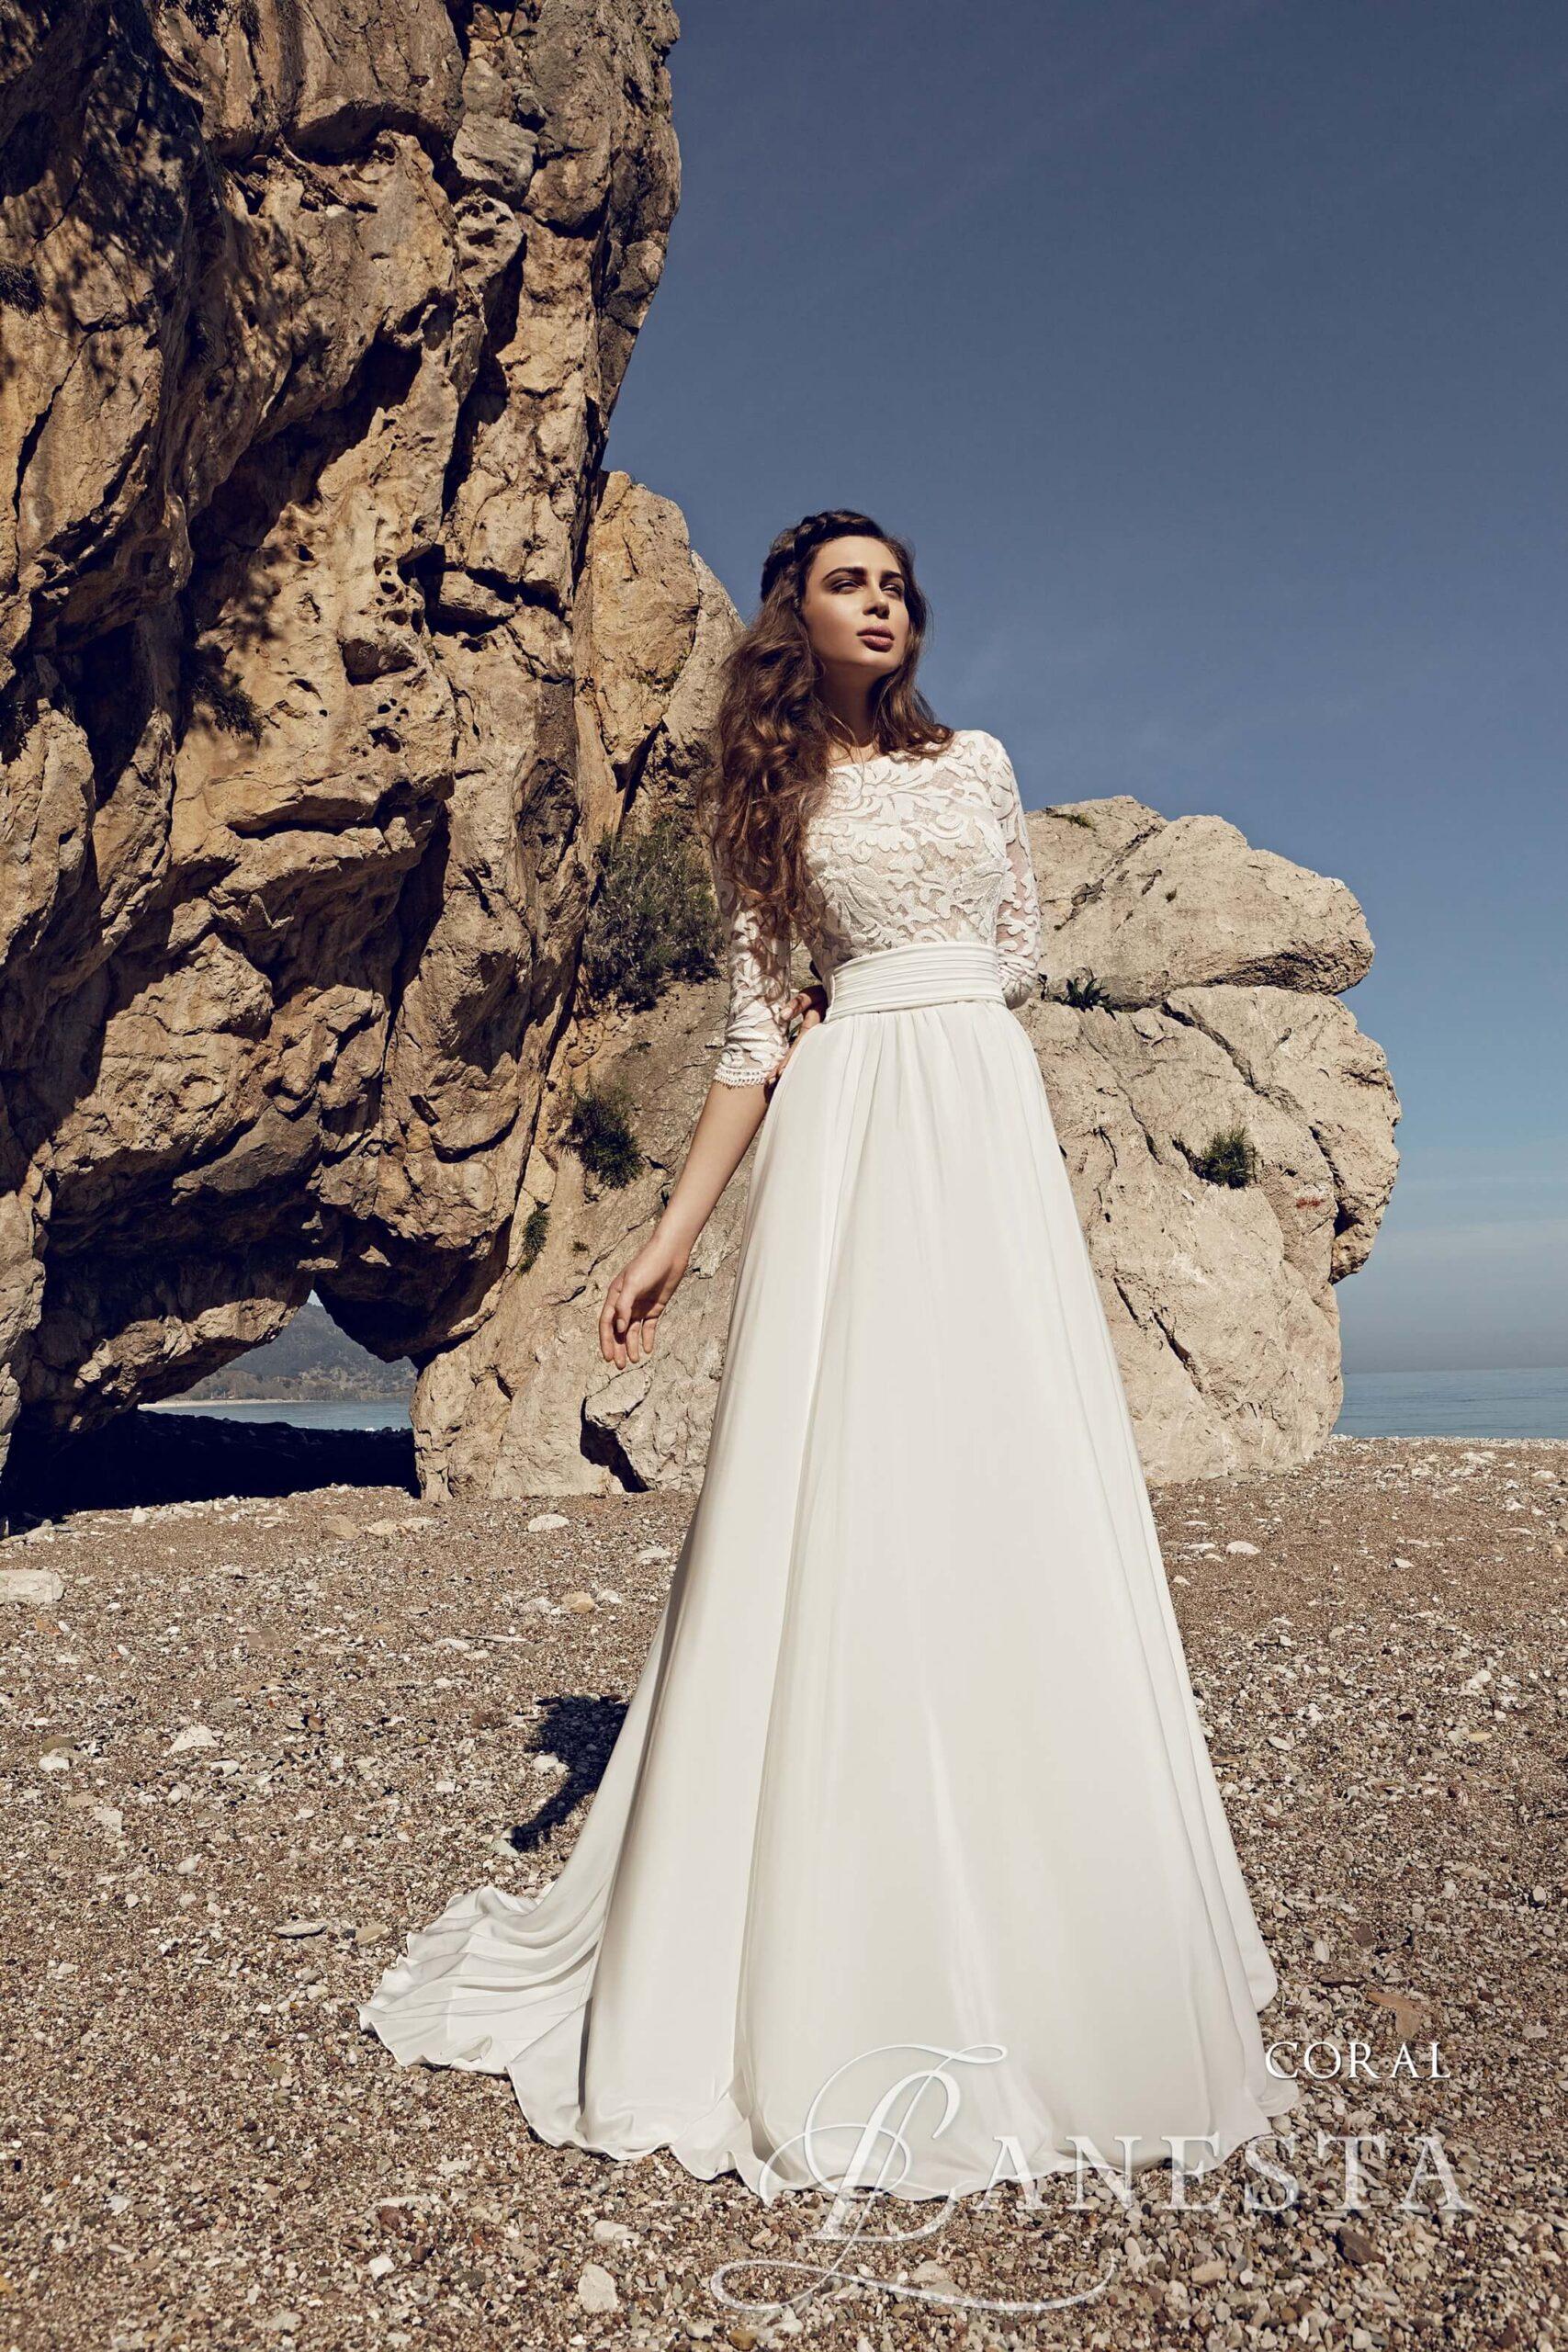 Весільна сукня Coral Lanesta